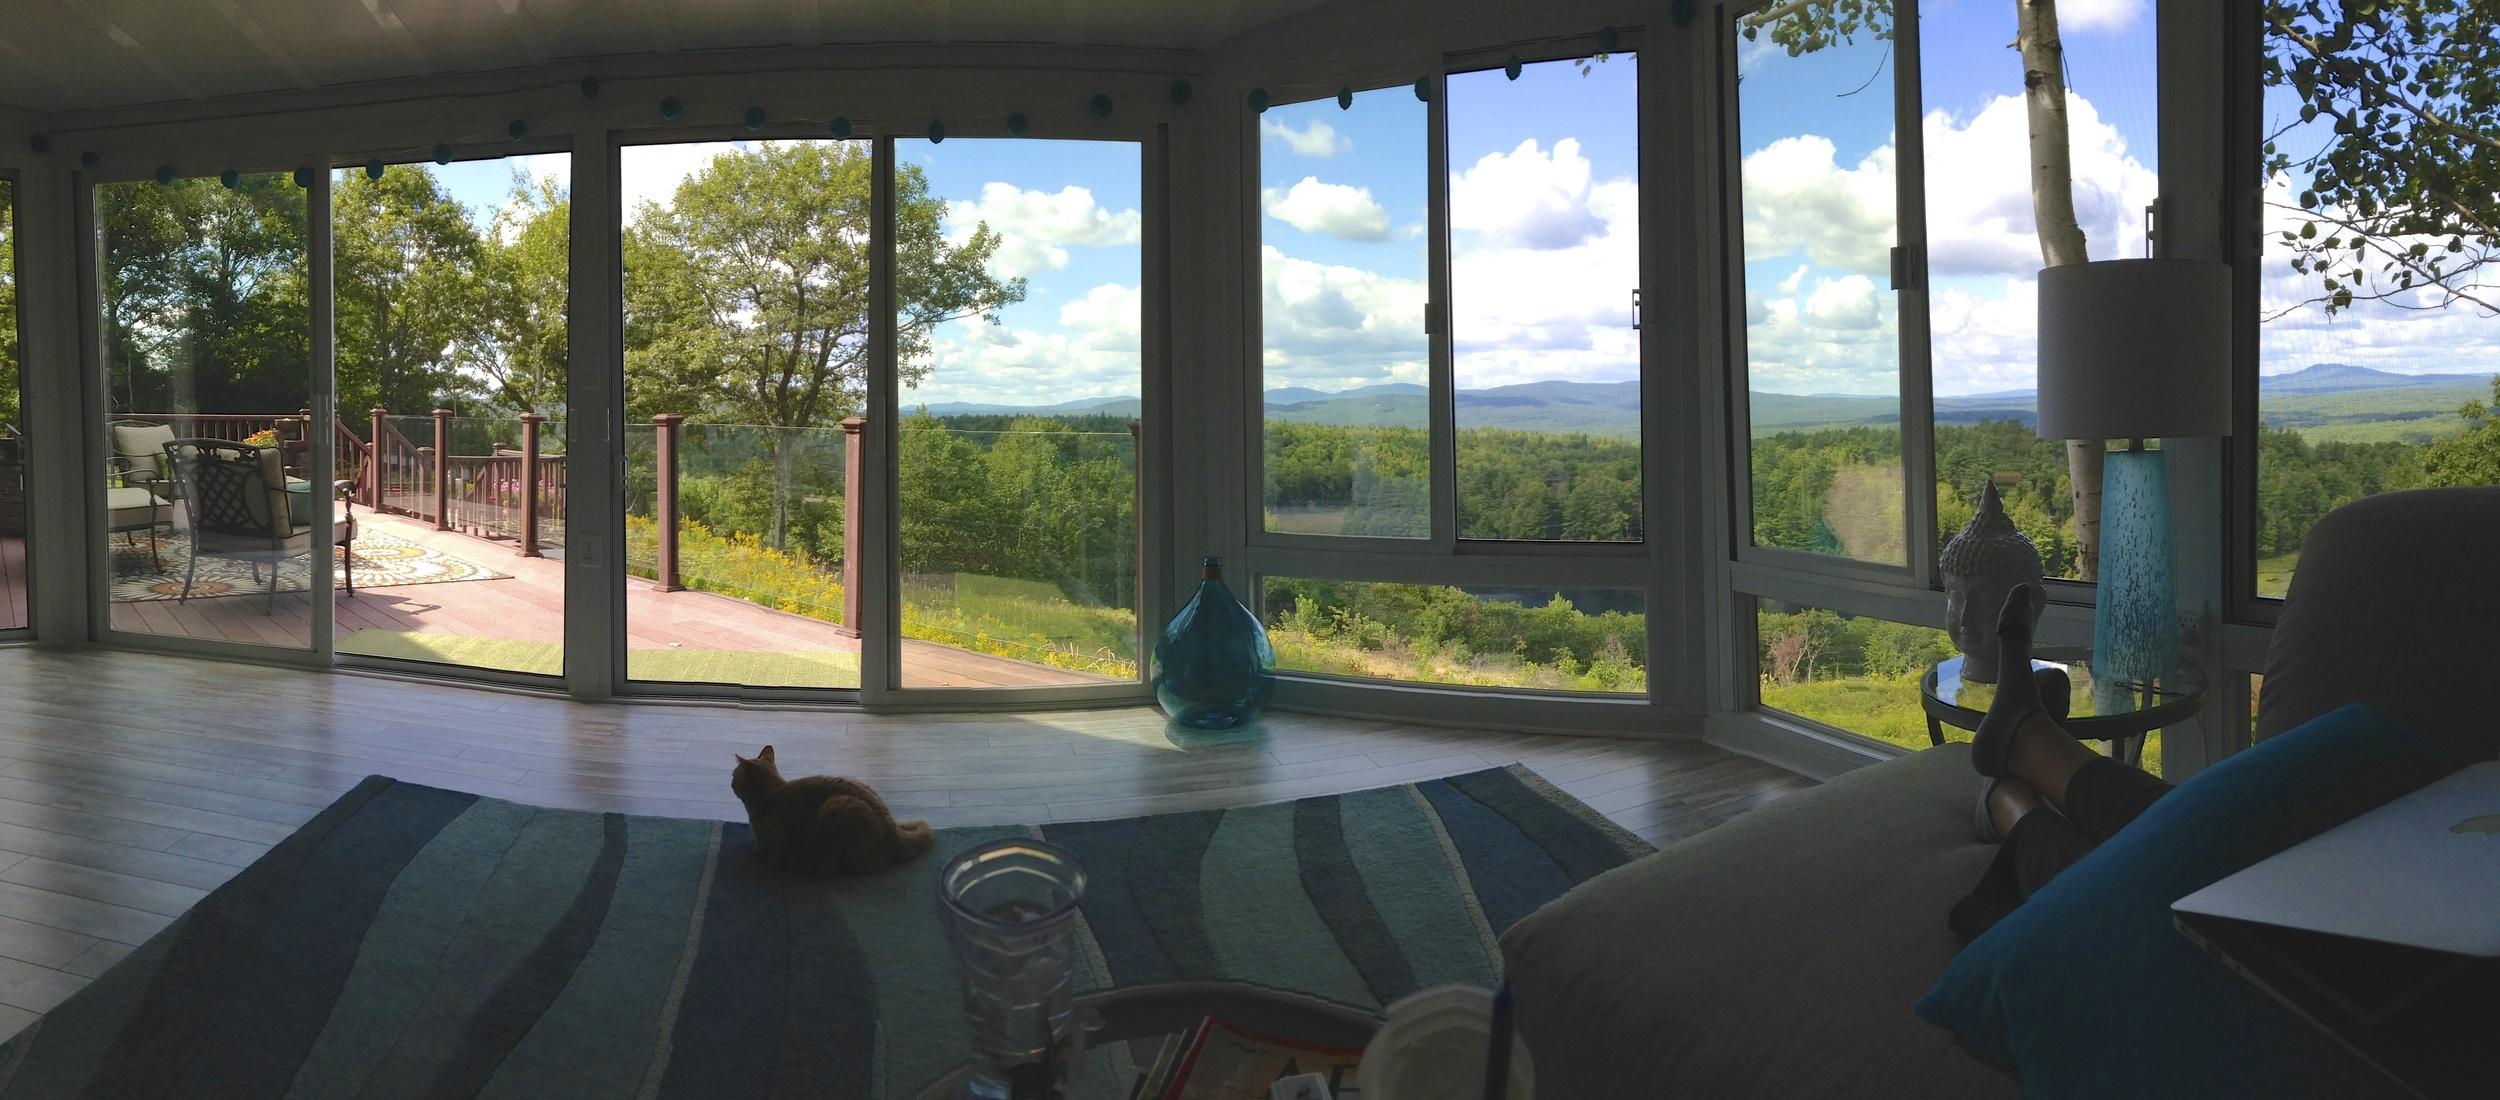 Sunroom design award winning project - New Boston, NH - Betterliving Sunrooms of New Hampshire & Erickson Construction Co., Inc.